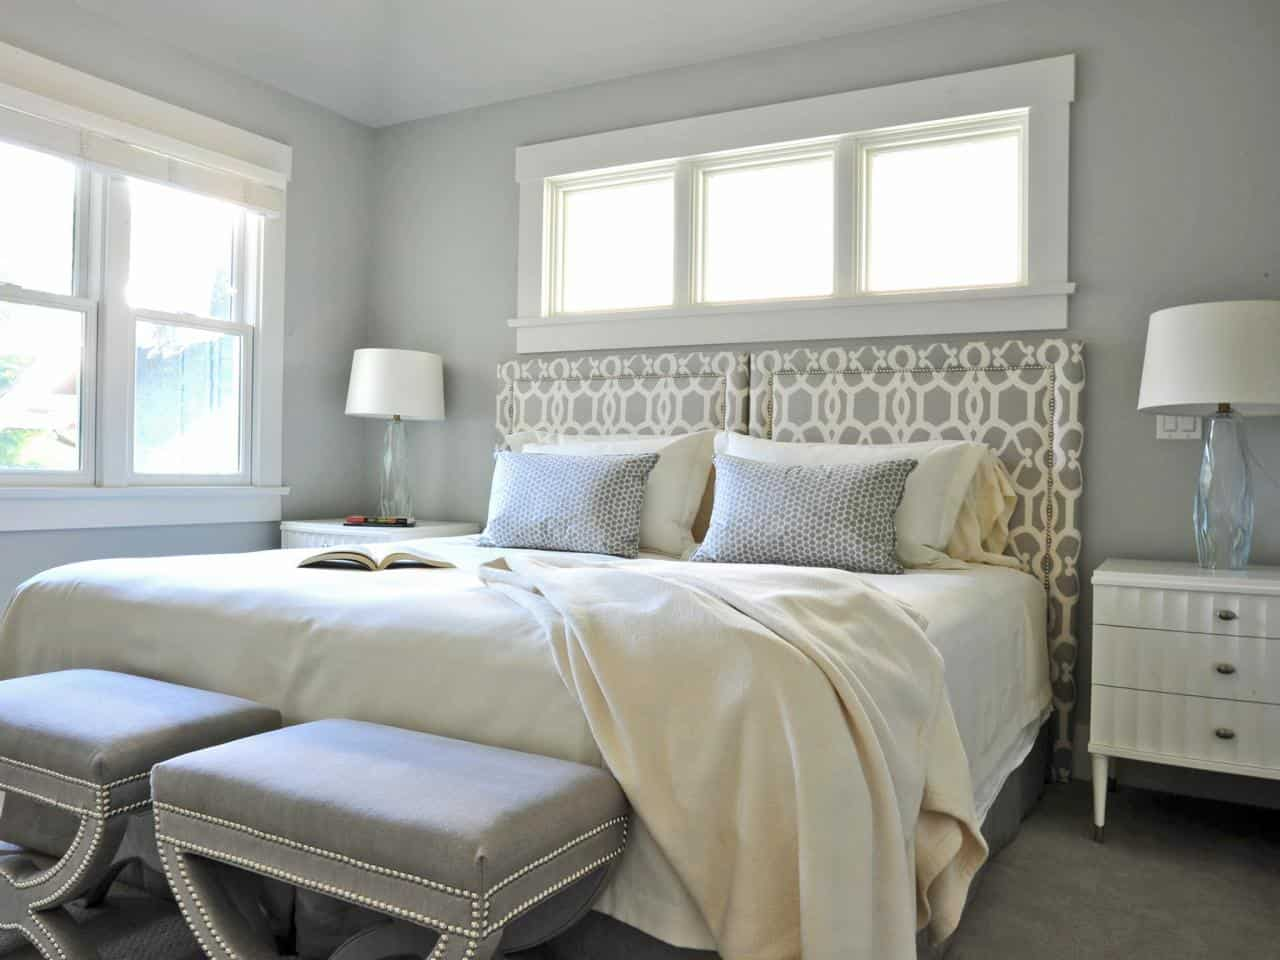 Gray-Bedroom-Walls-Photo-Lady-Have-Gray-Bedroom